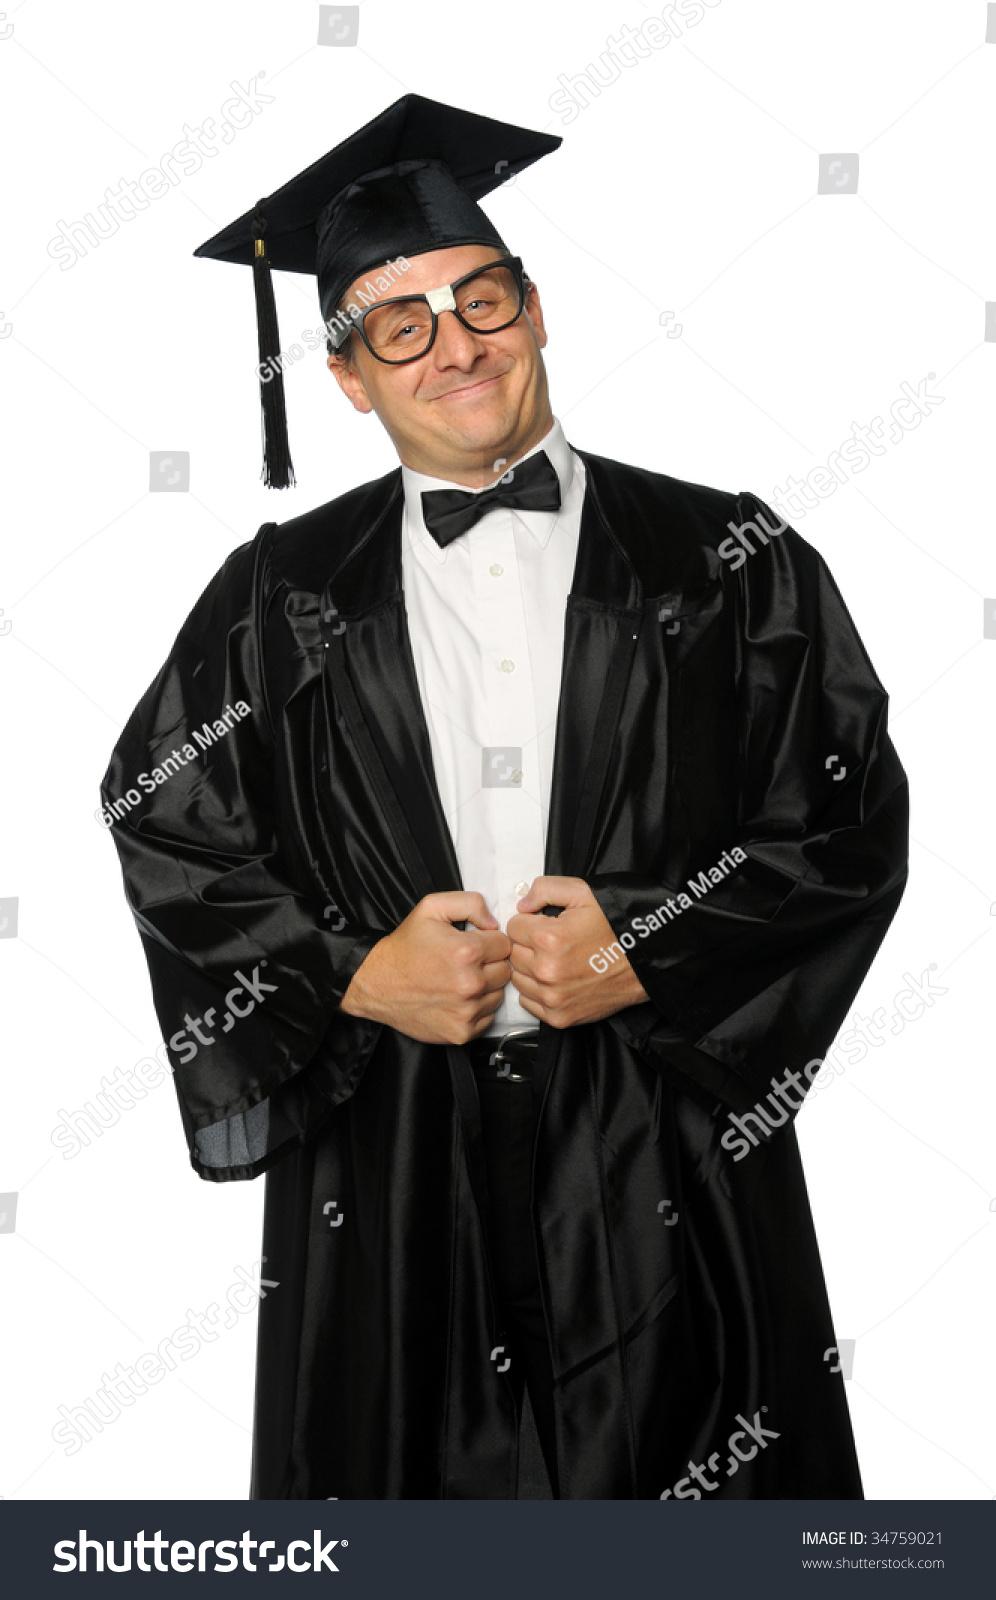 Nerd Graduate Dressed Gown Mortarboard Stock Photo (Edit Now ...